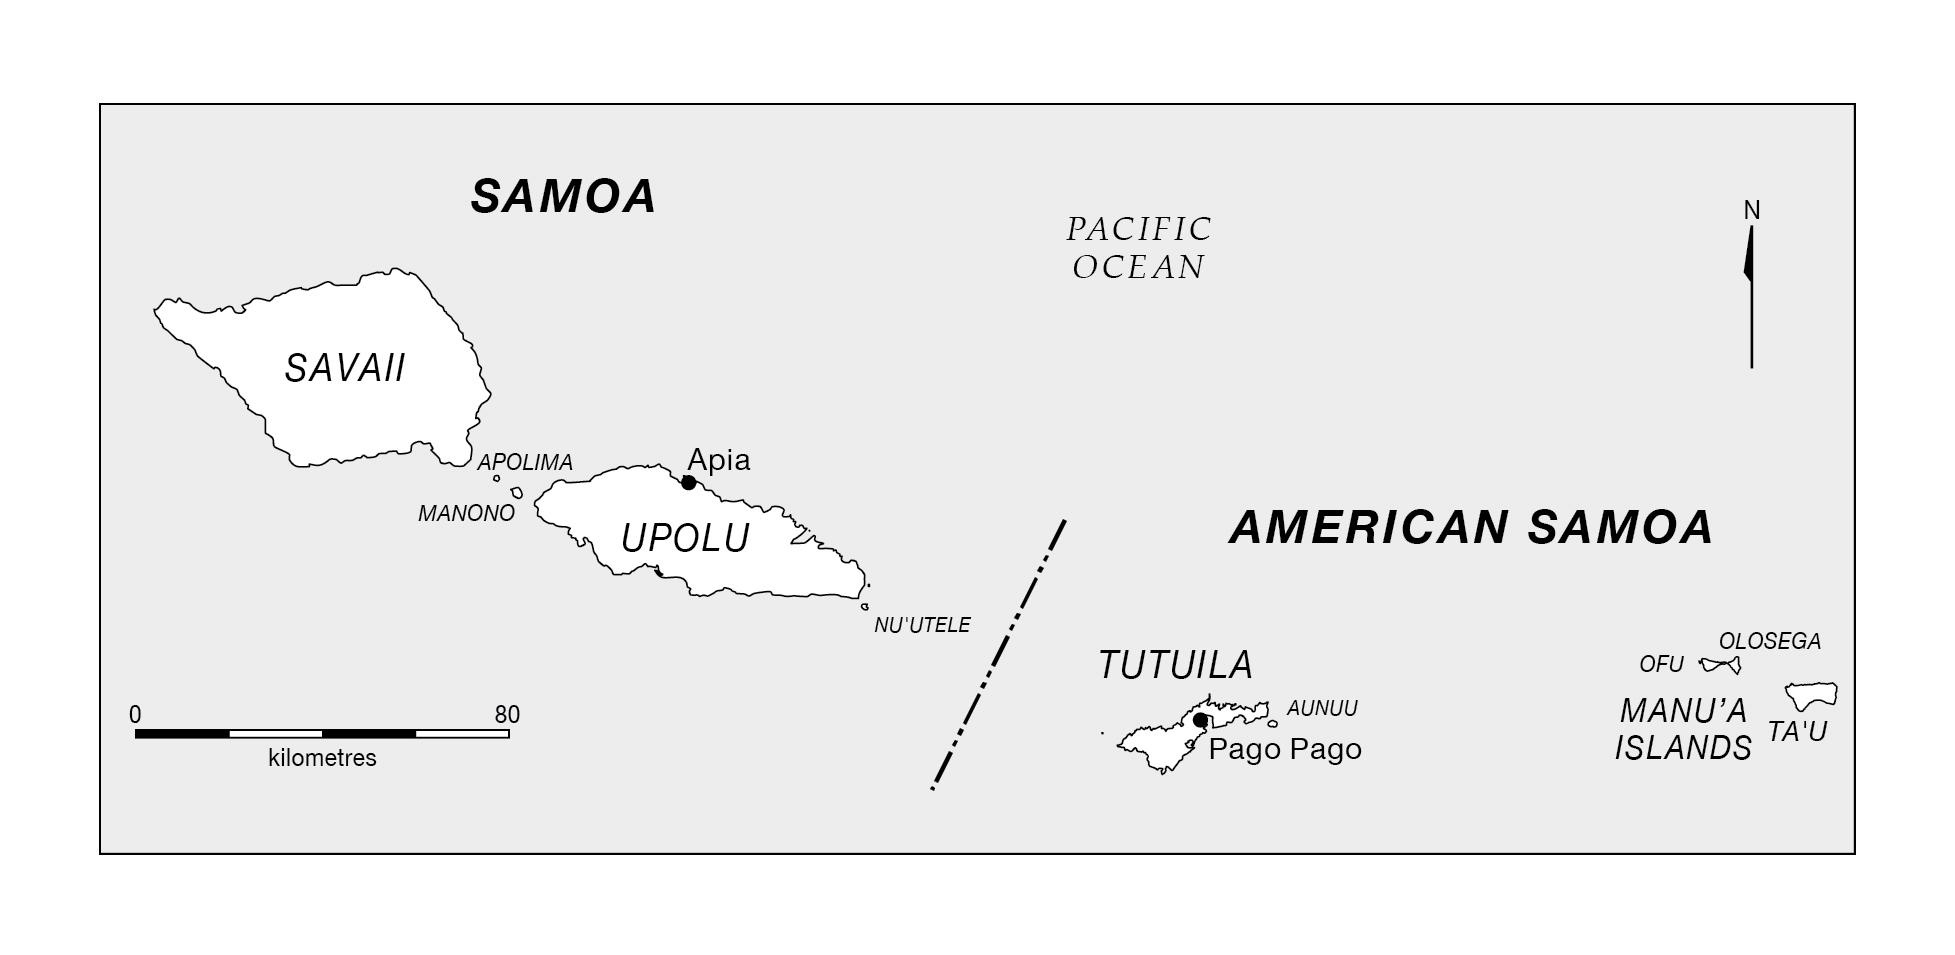 American samoa in world map on